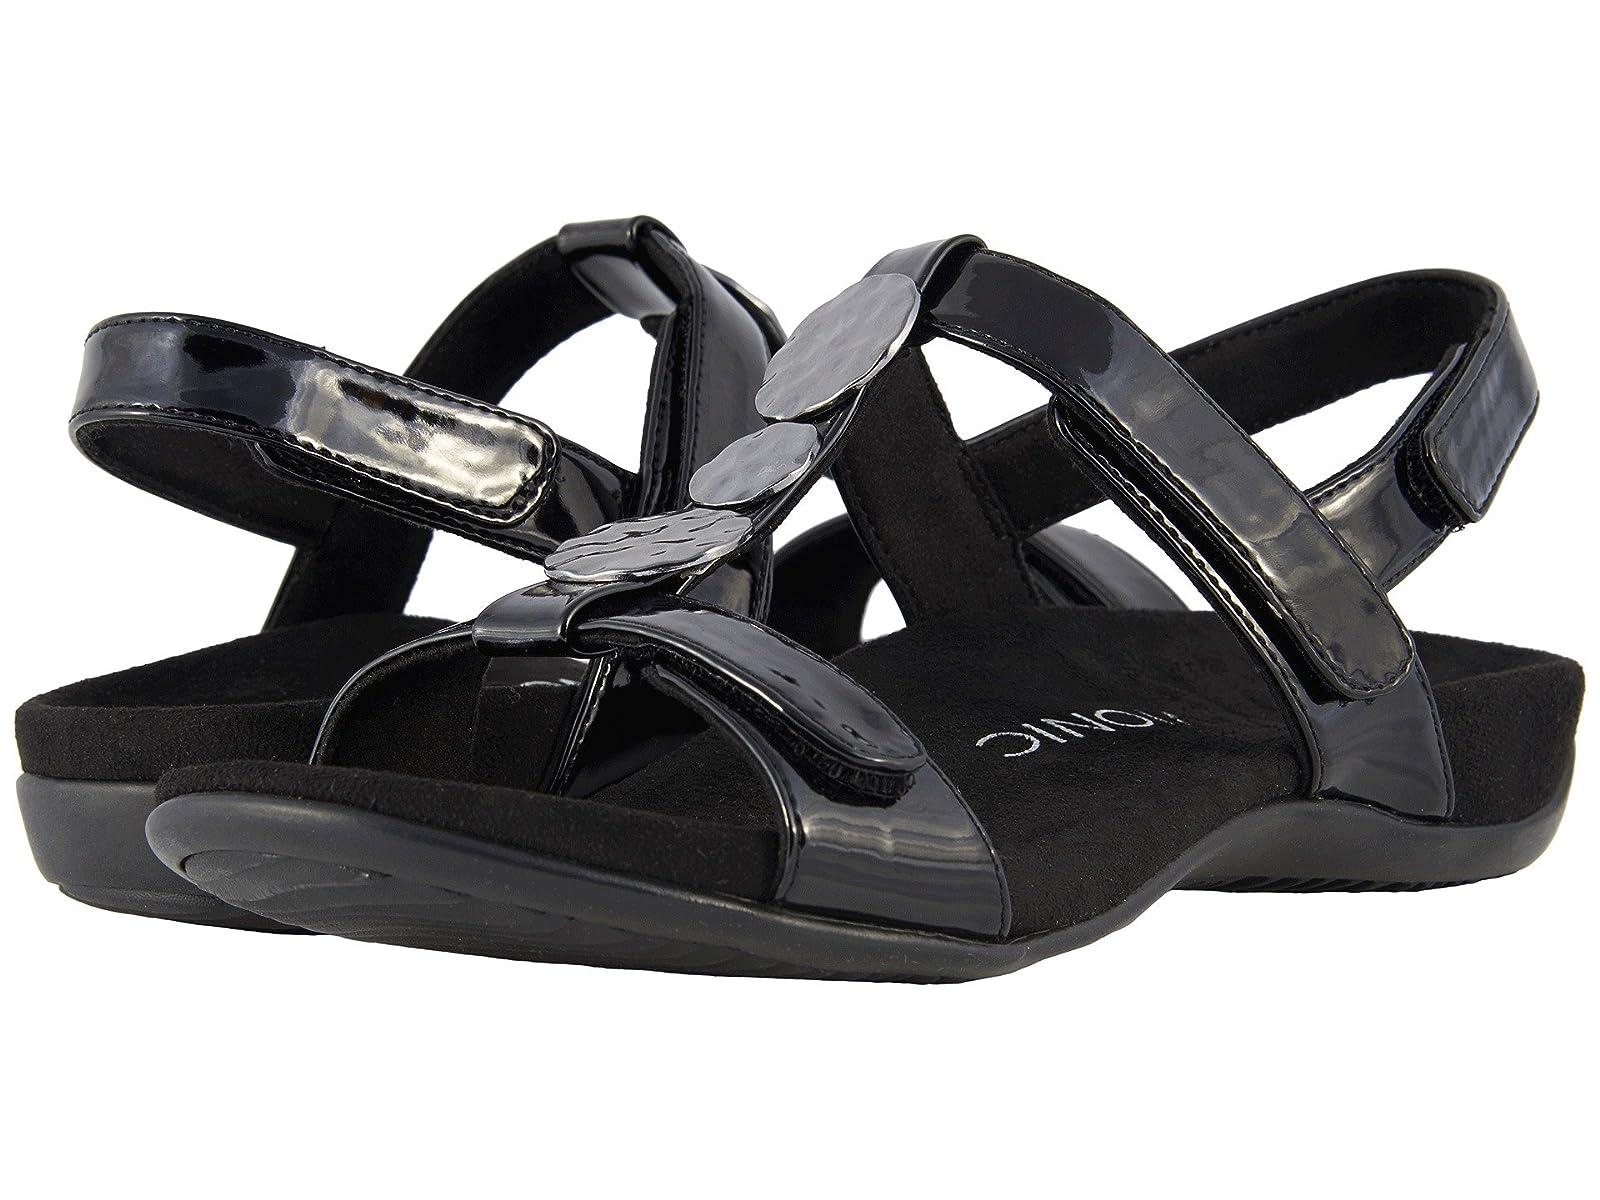 VIONIC FarraAtmospheric grades have affordable shoes